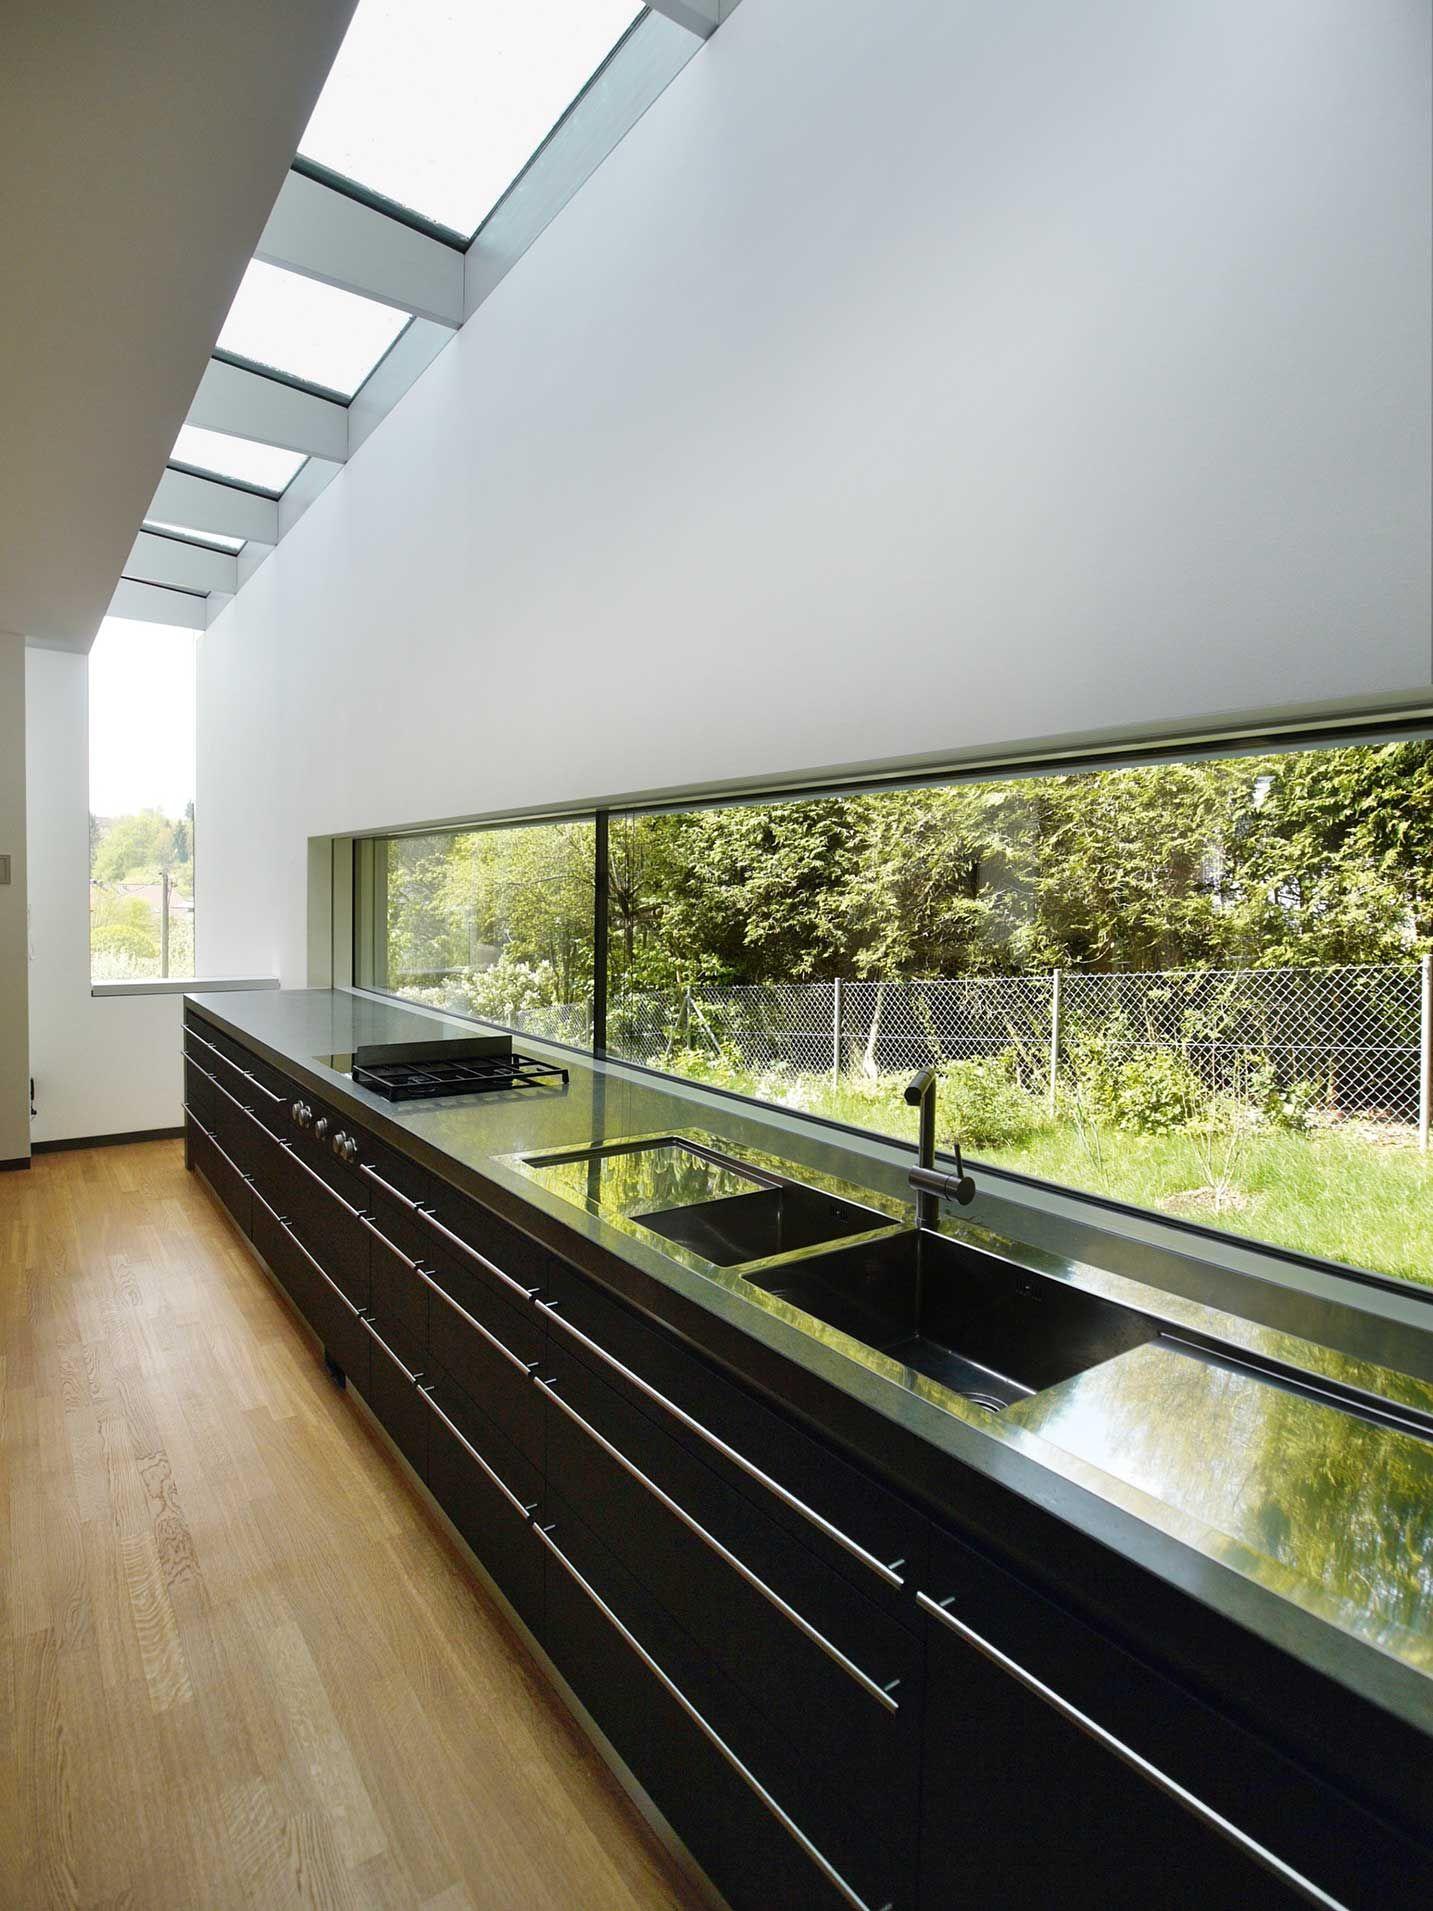 Kleiner Grundriss Am Hang Inspirational Kitchens Pent House